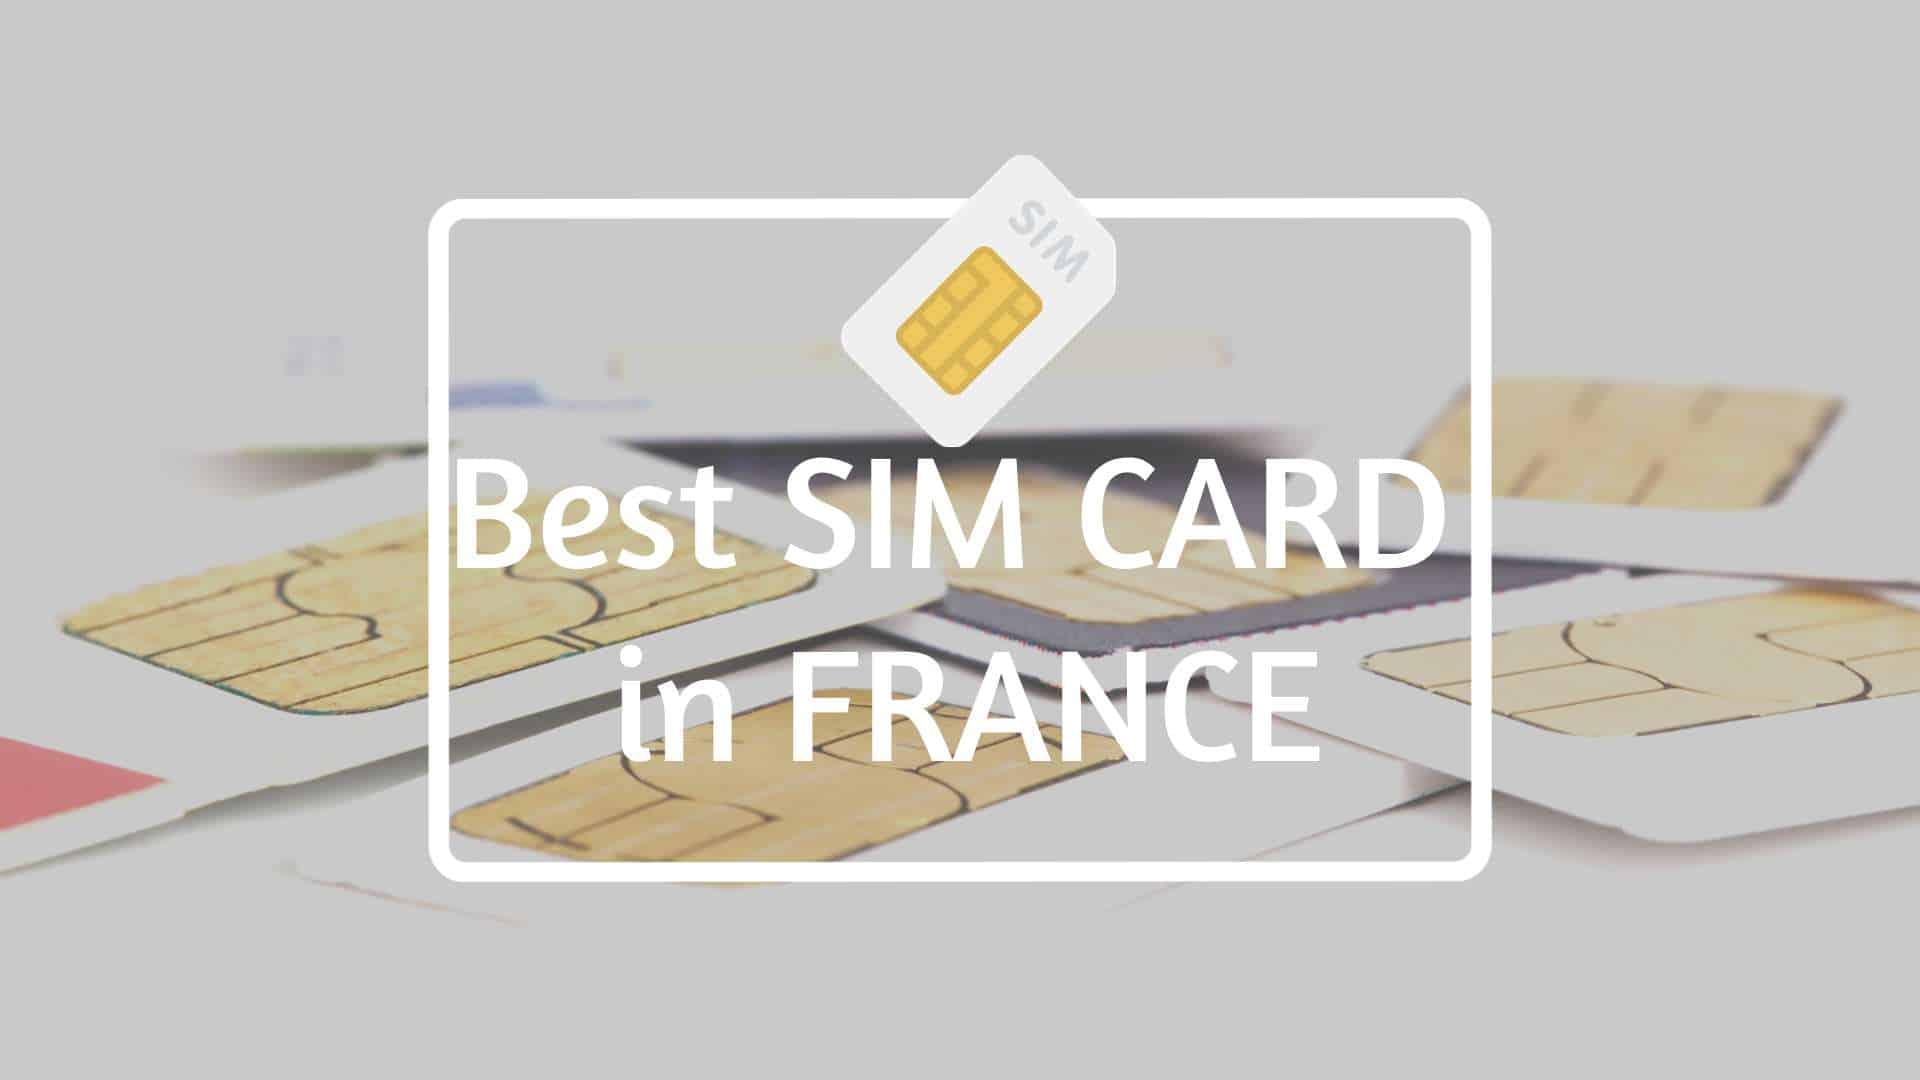 Best SIM CARD in FRANCE